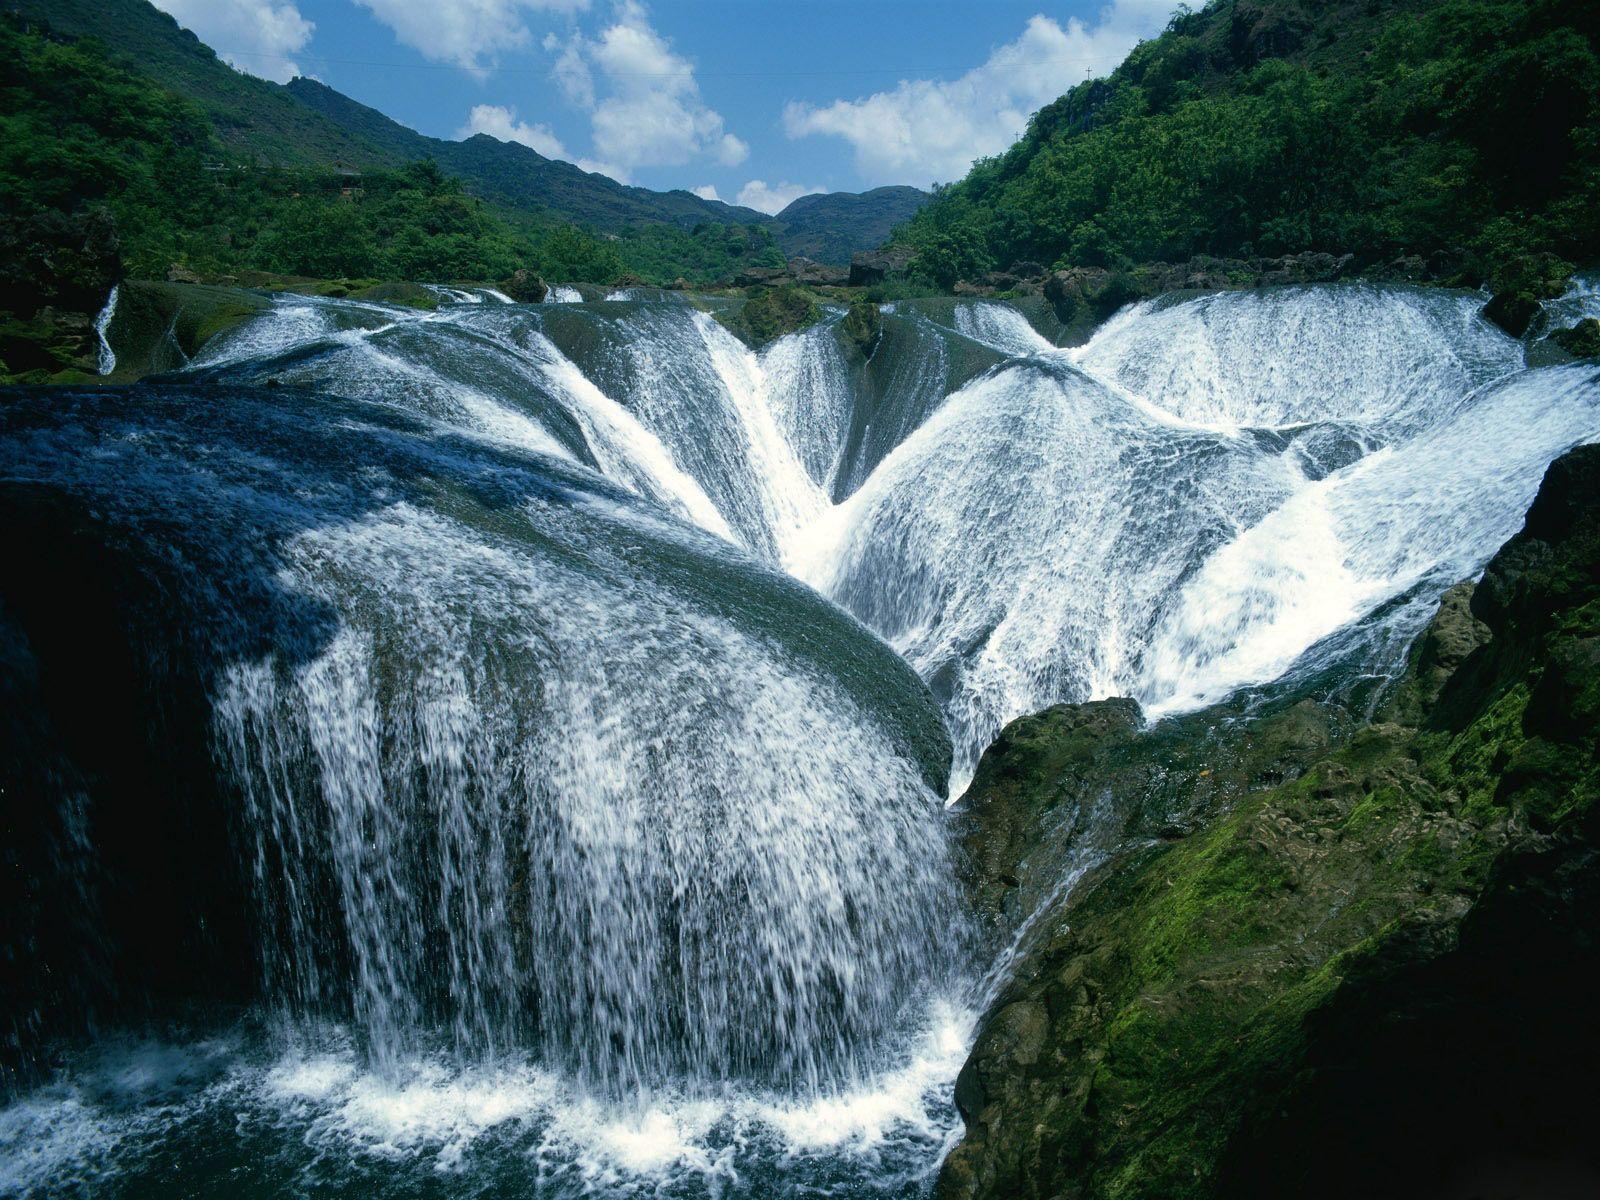 Chang-Jiang-Yangtze River, China